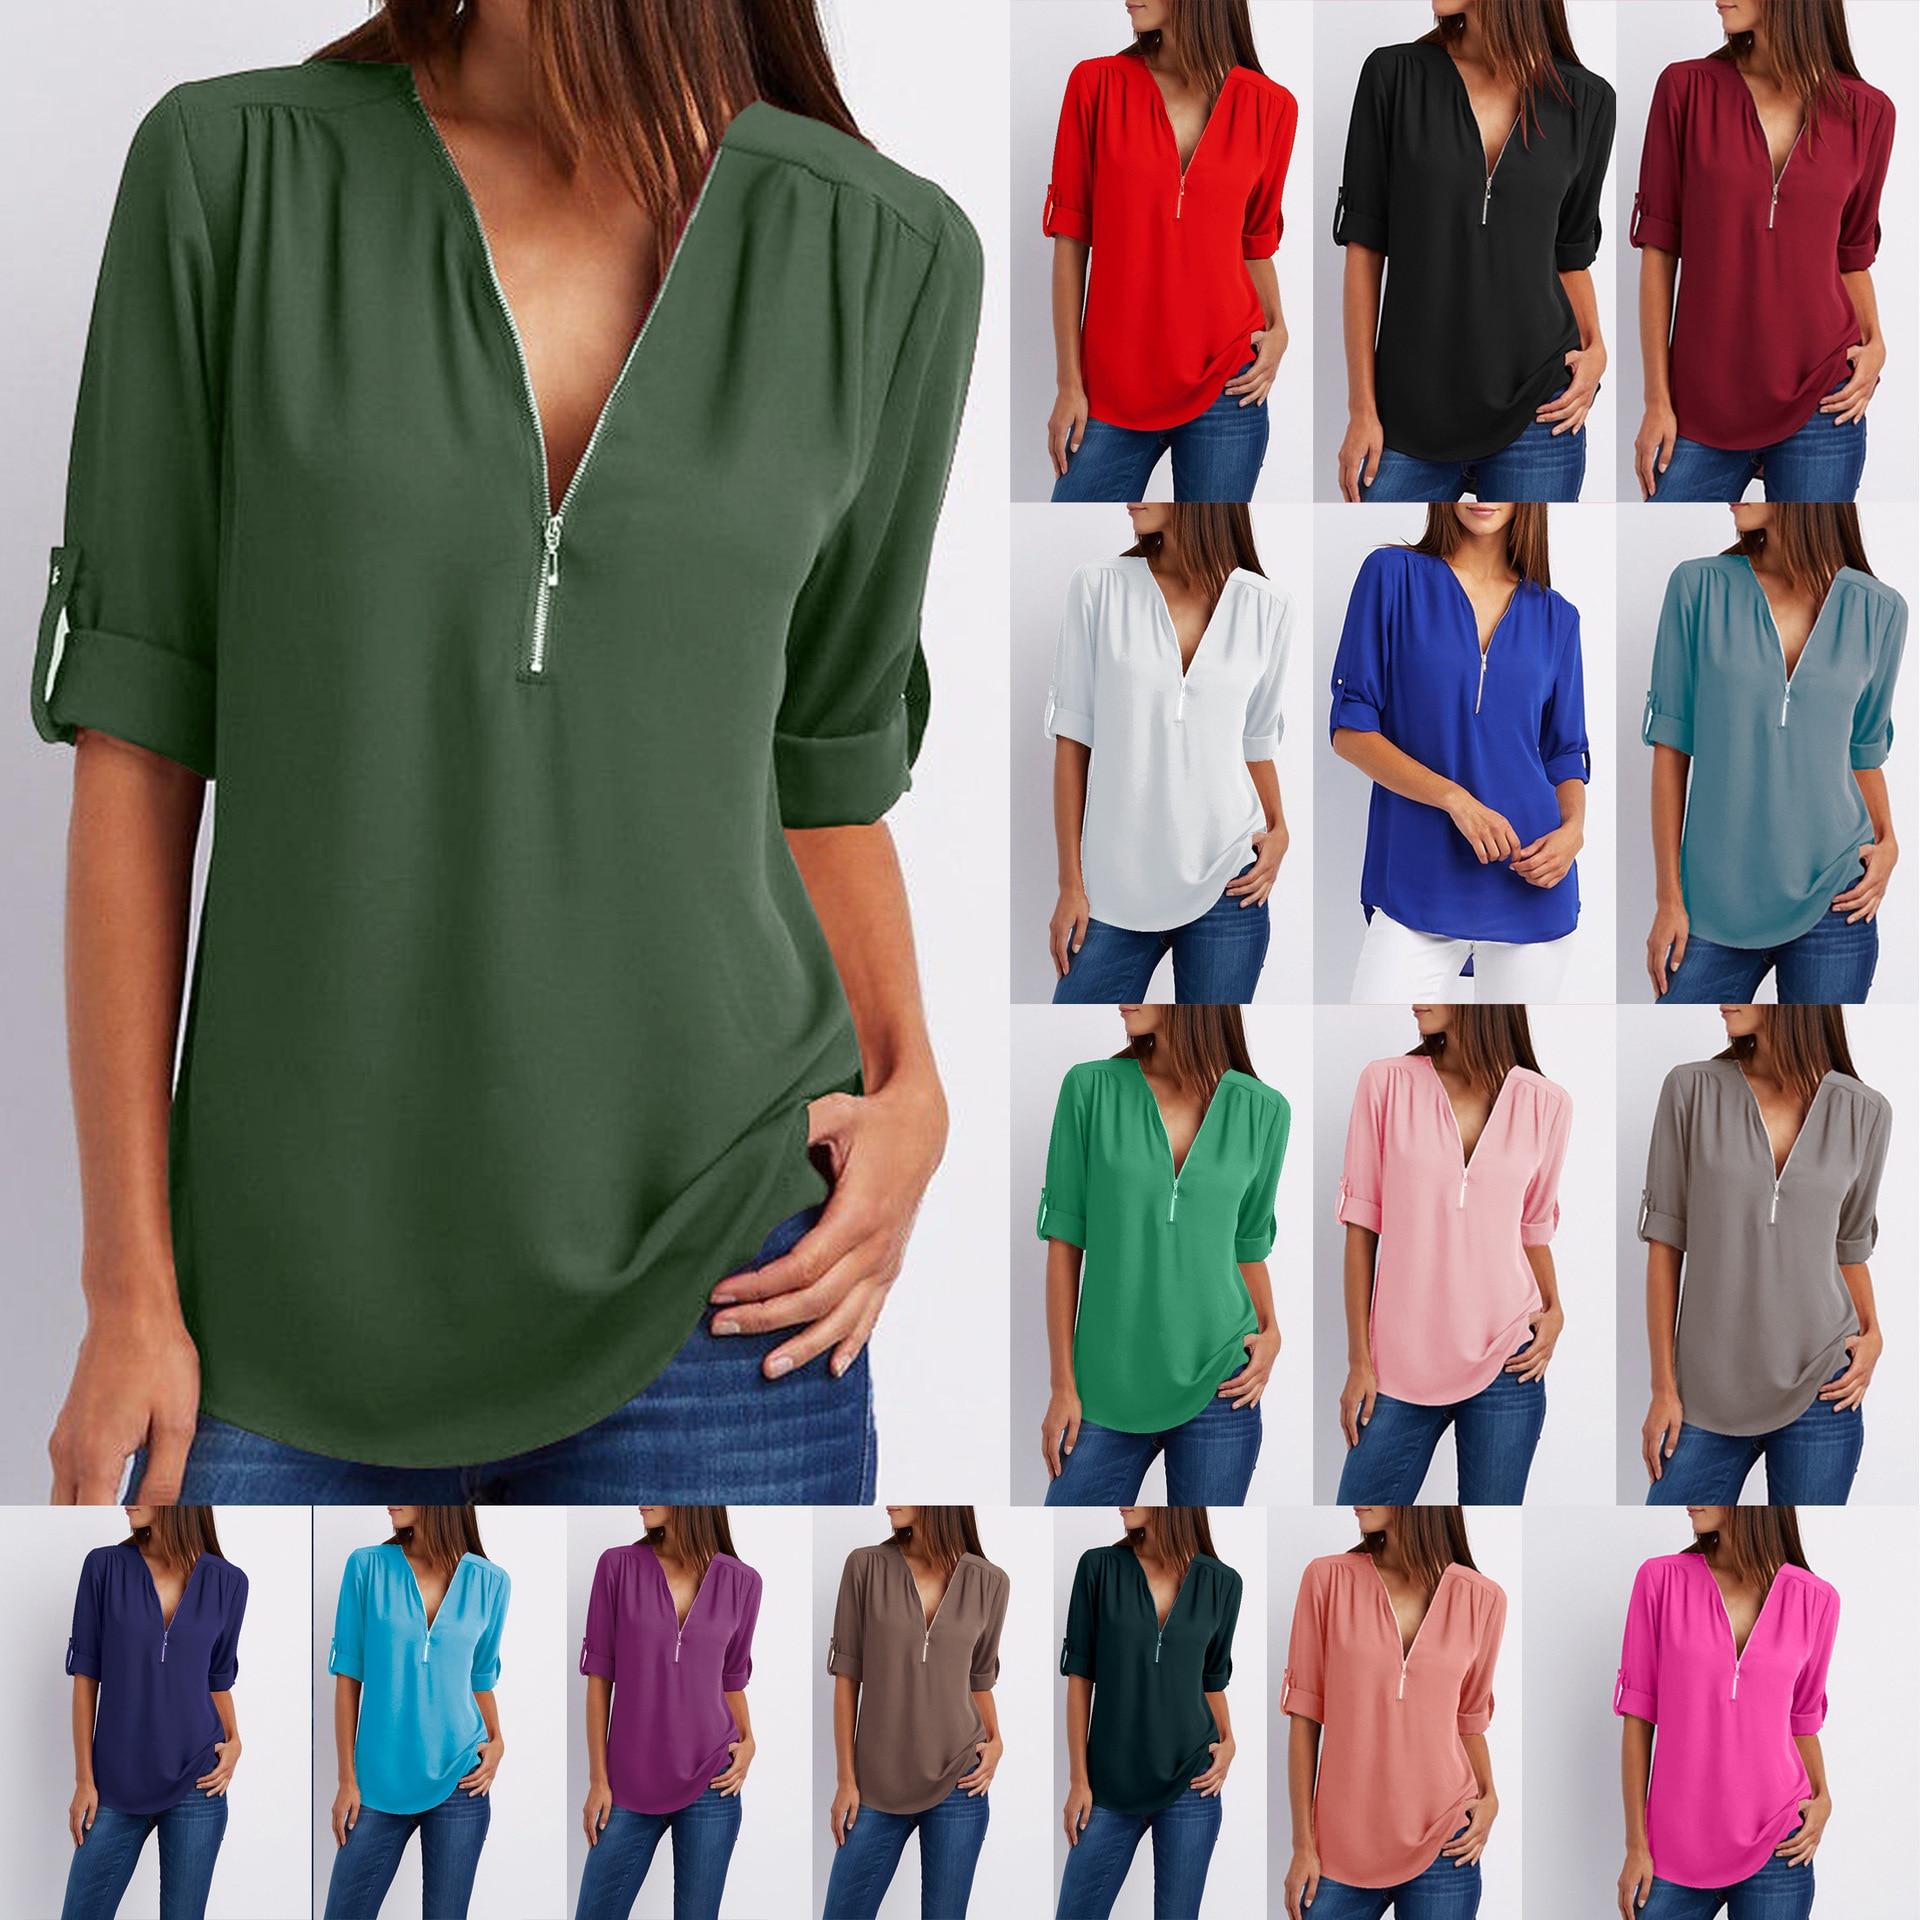 Women Shirts V-neck Zipper Large Size Womens Long-sleeved Sleeved Loose Snow Spinning Shirt  Women Tops